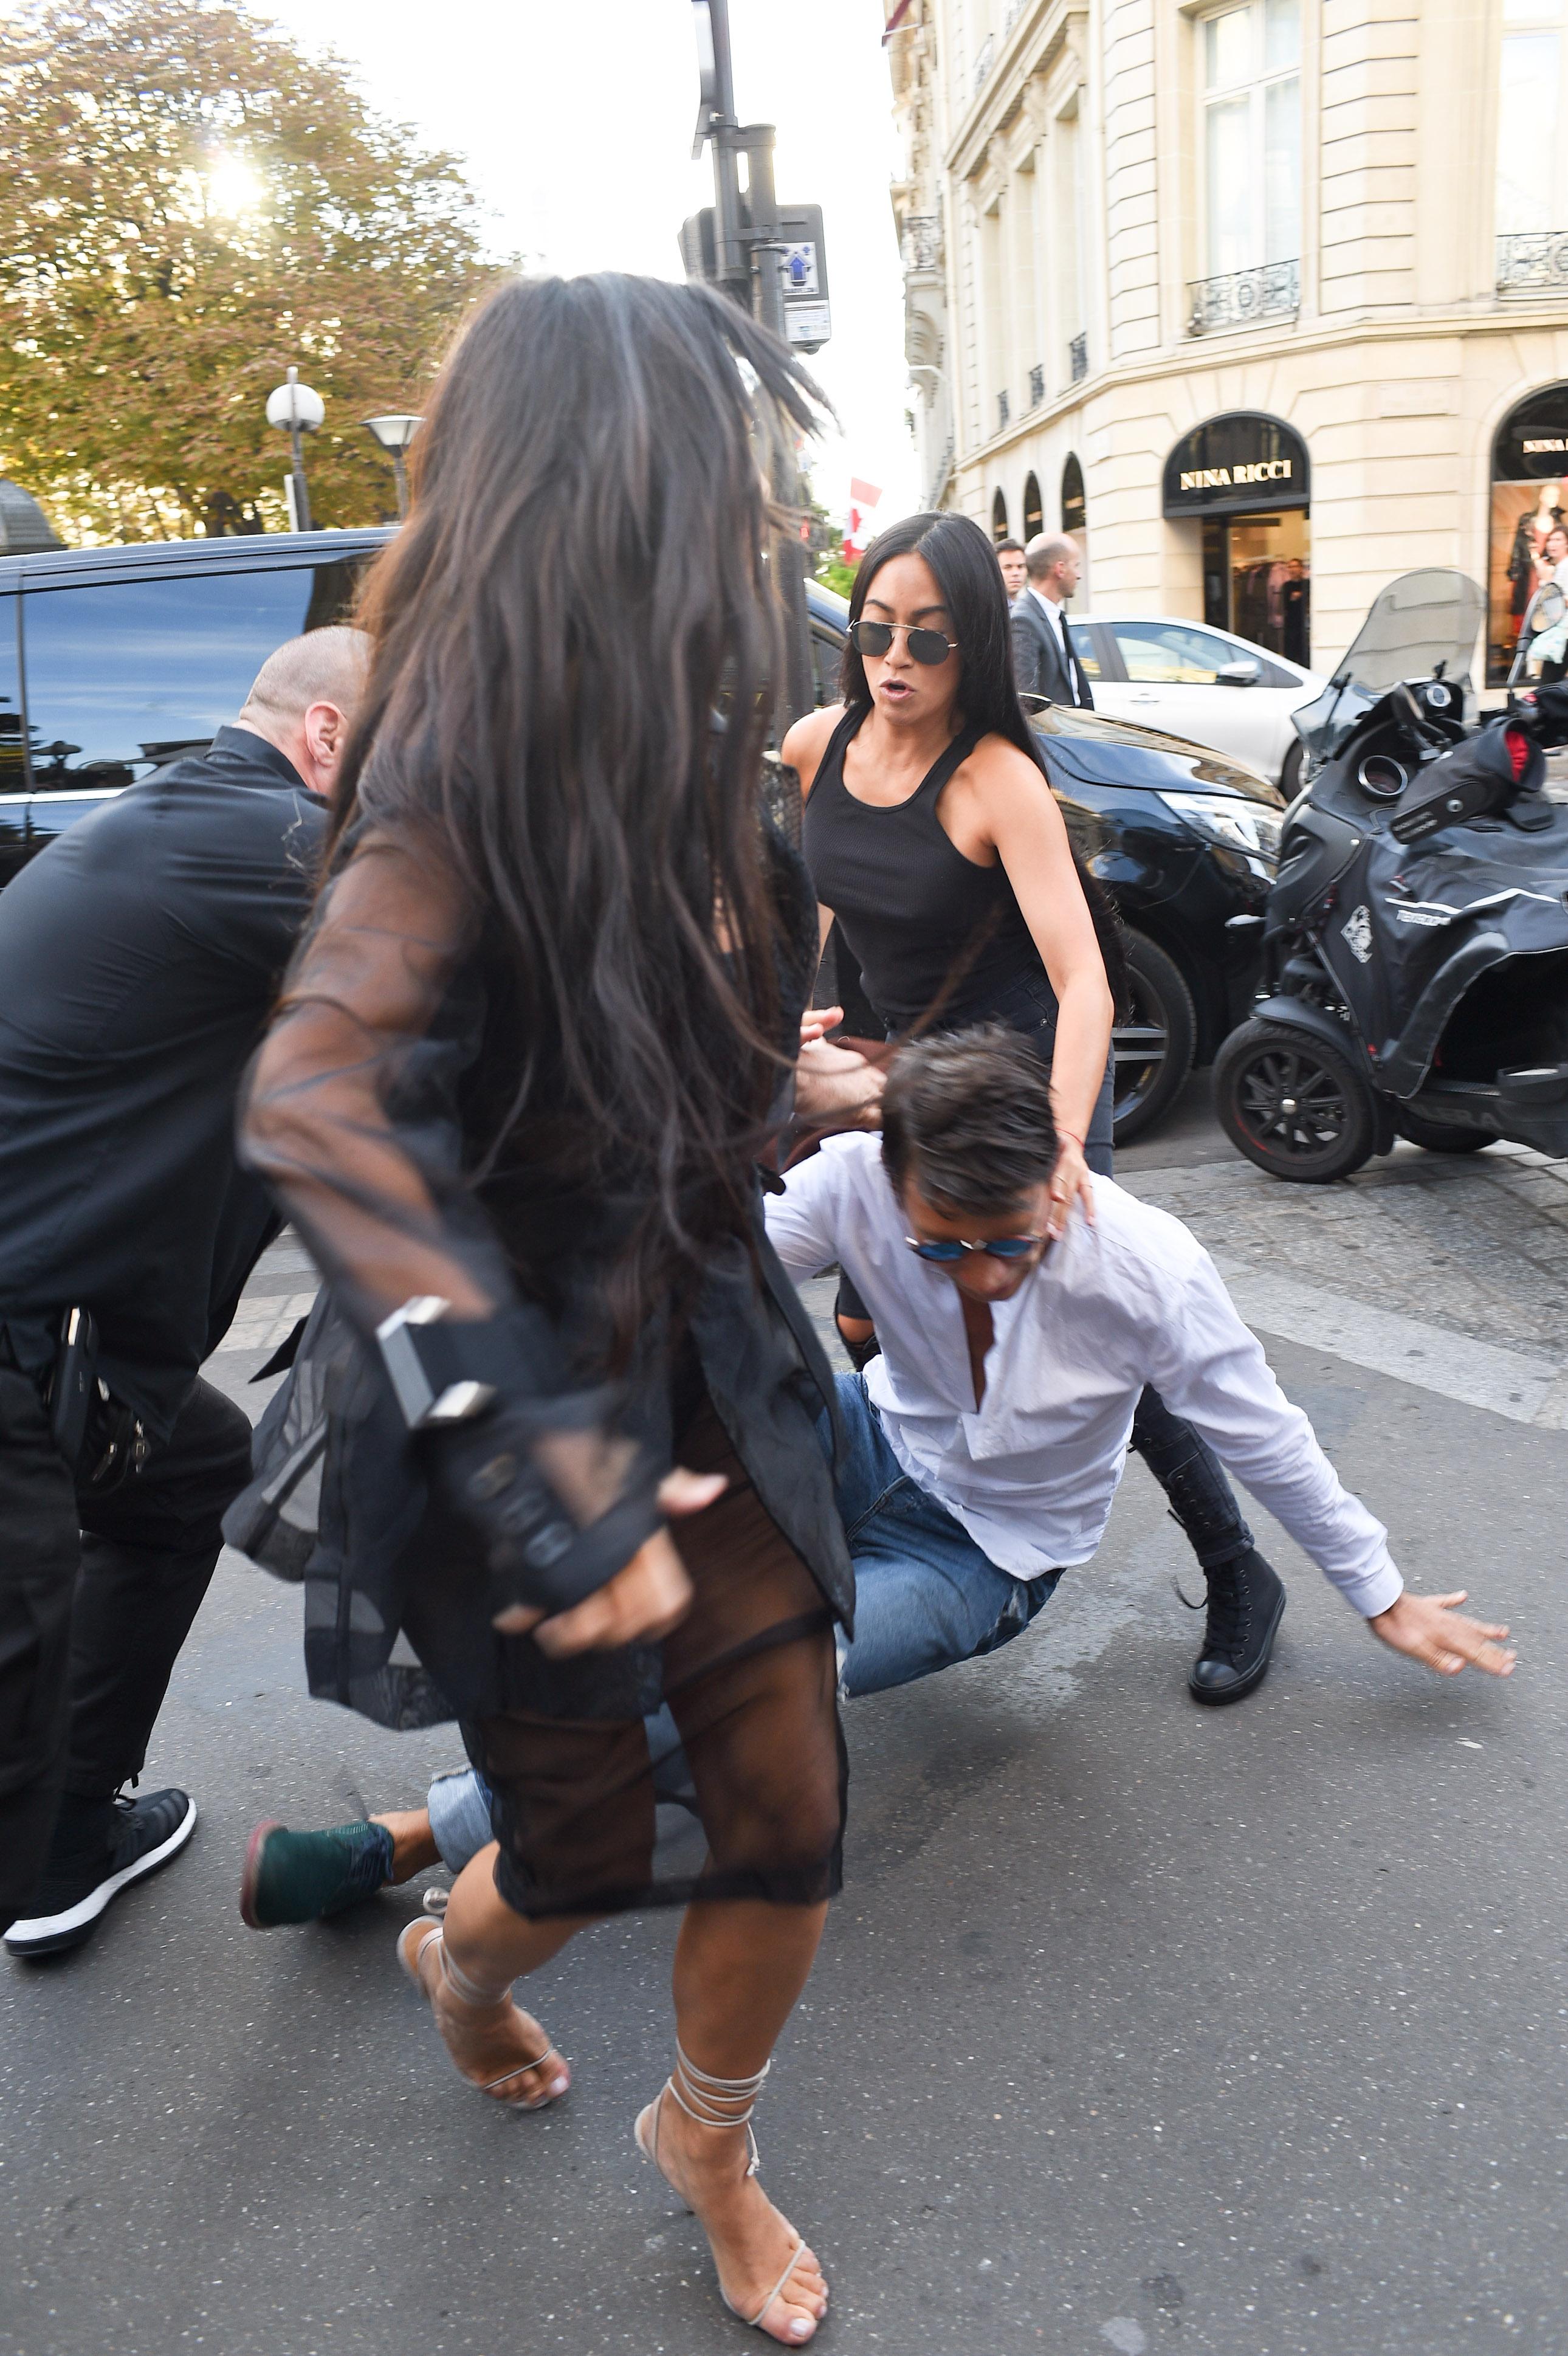 Celebrity pranker Vitalii Sediuk strikes again, this time grabbing Kim Kardashian at L'Avenue restaurant in Paris Pictured: Vitalii Sediuk ,Kim Kardashian Ref: SPL1363902 280916 Picture by: Neil Warner / Splash News Splash News and Pictures Los Angeles:310-821-2666 New York: 212-619-2666 London: 870-934-2666 photodesk@splashnews.com